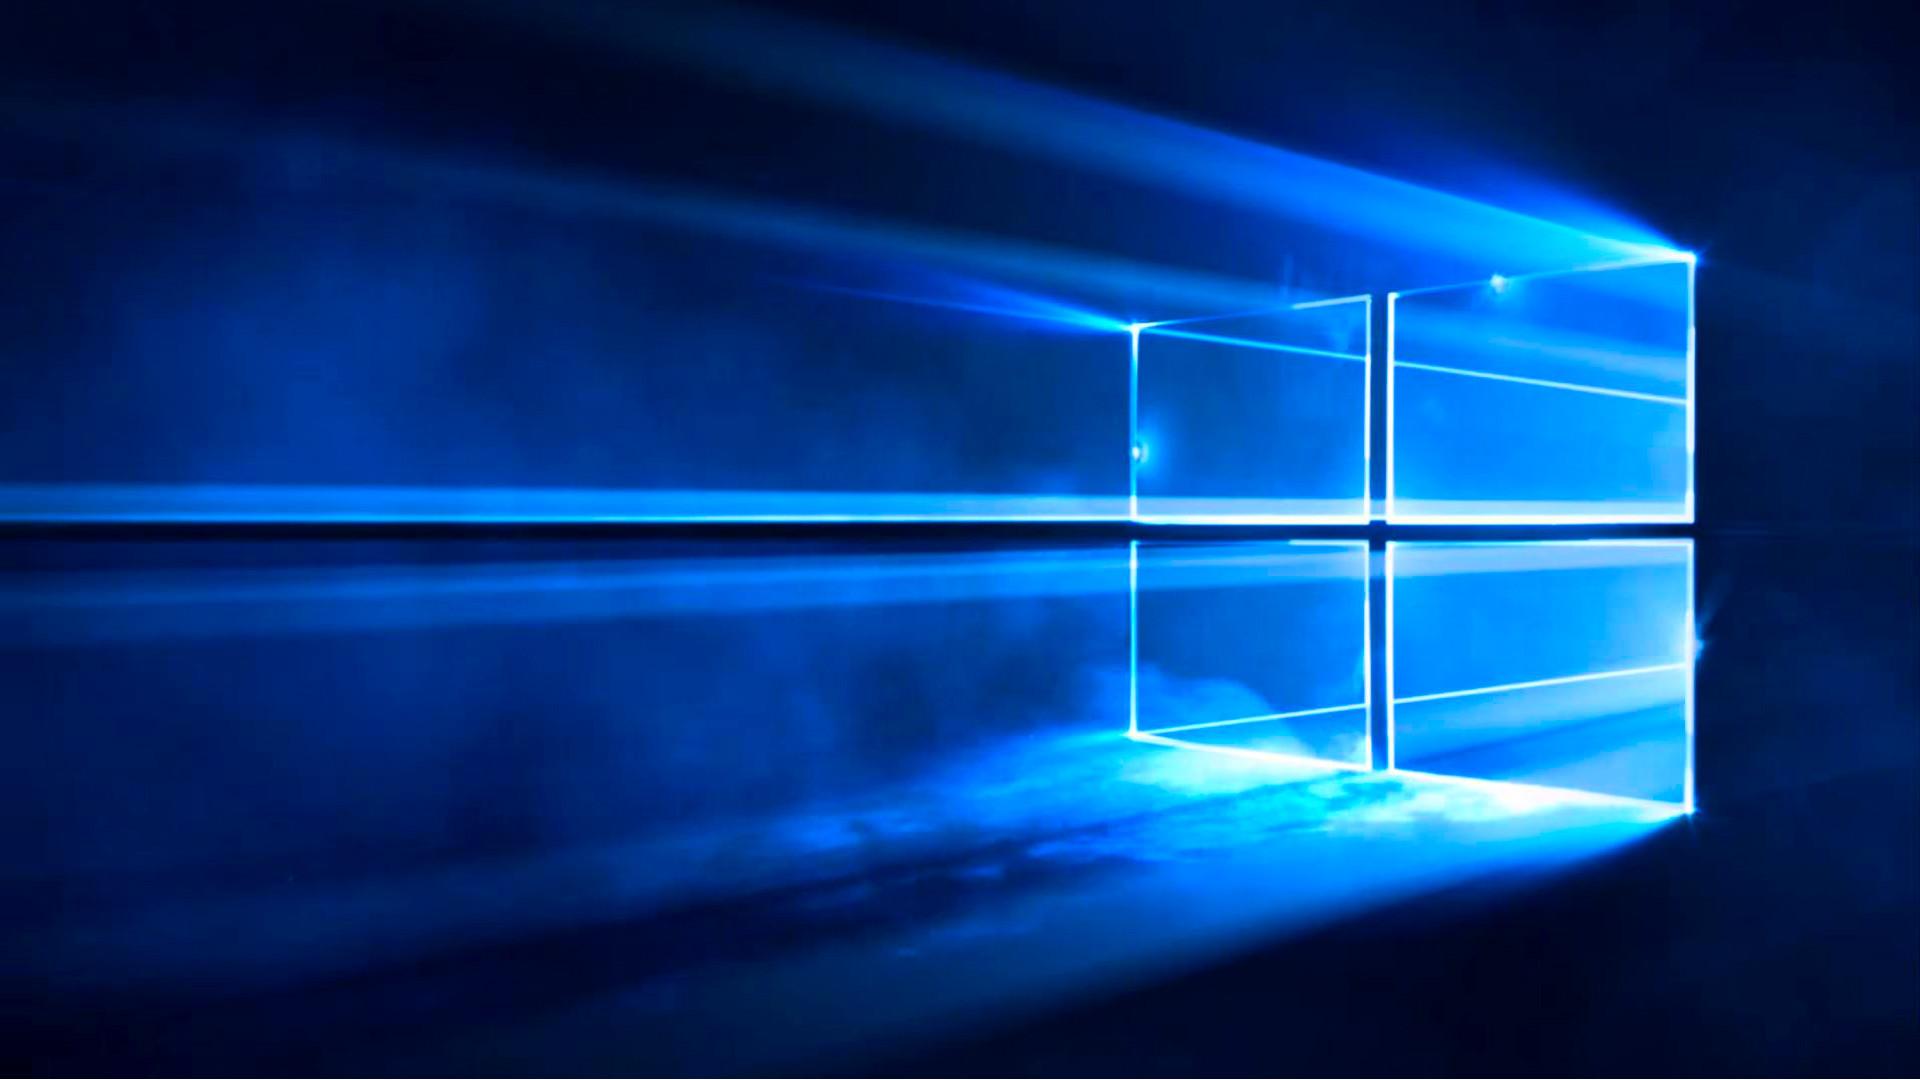 Microsoft Windows 10 Full HD Pics Wallpapers 15197 – Amazing .